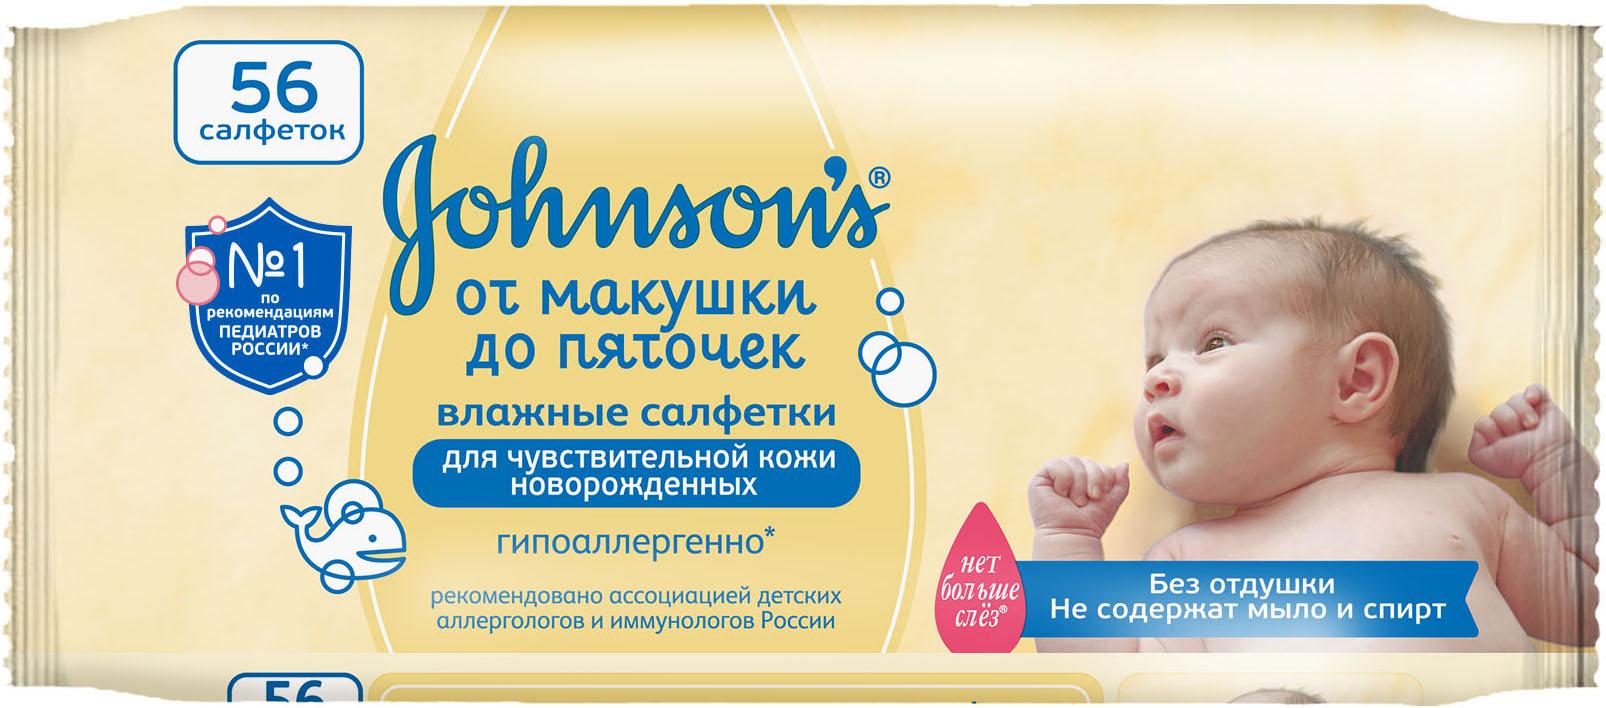 Влажные салфетки Johnson's baby От макушки до пяточек 56 шт johnson s baby от макушки до пяточек влажные салфетки детские 15 шт